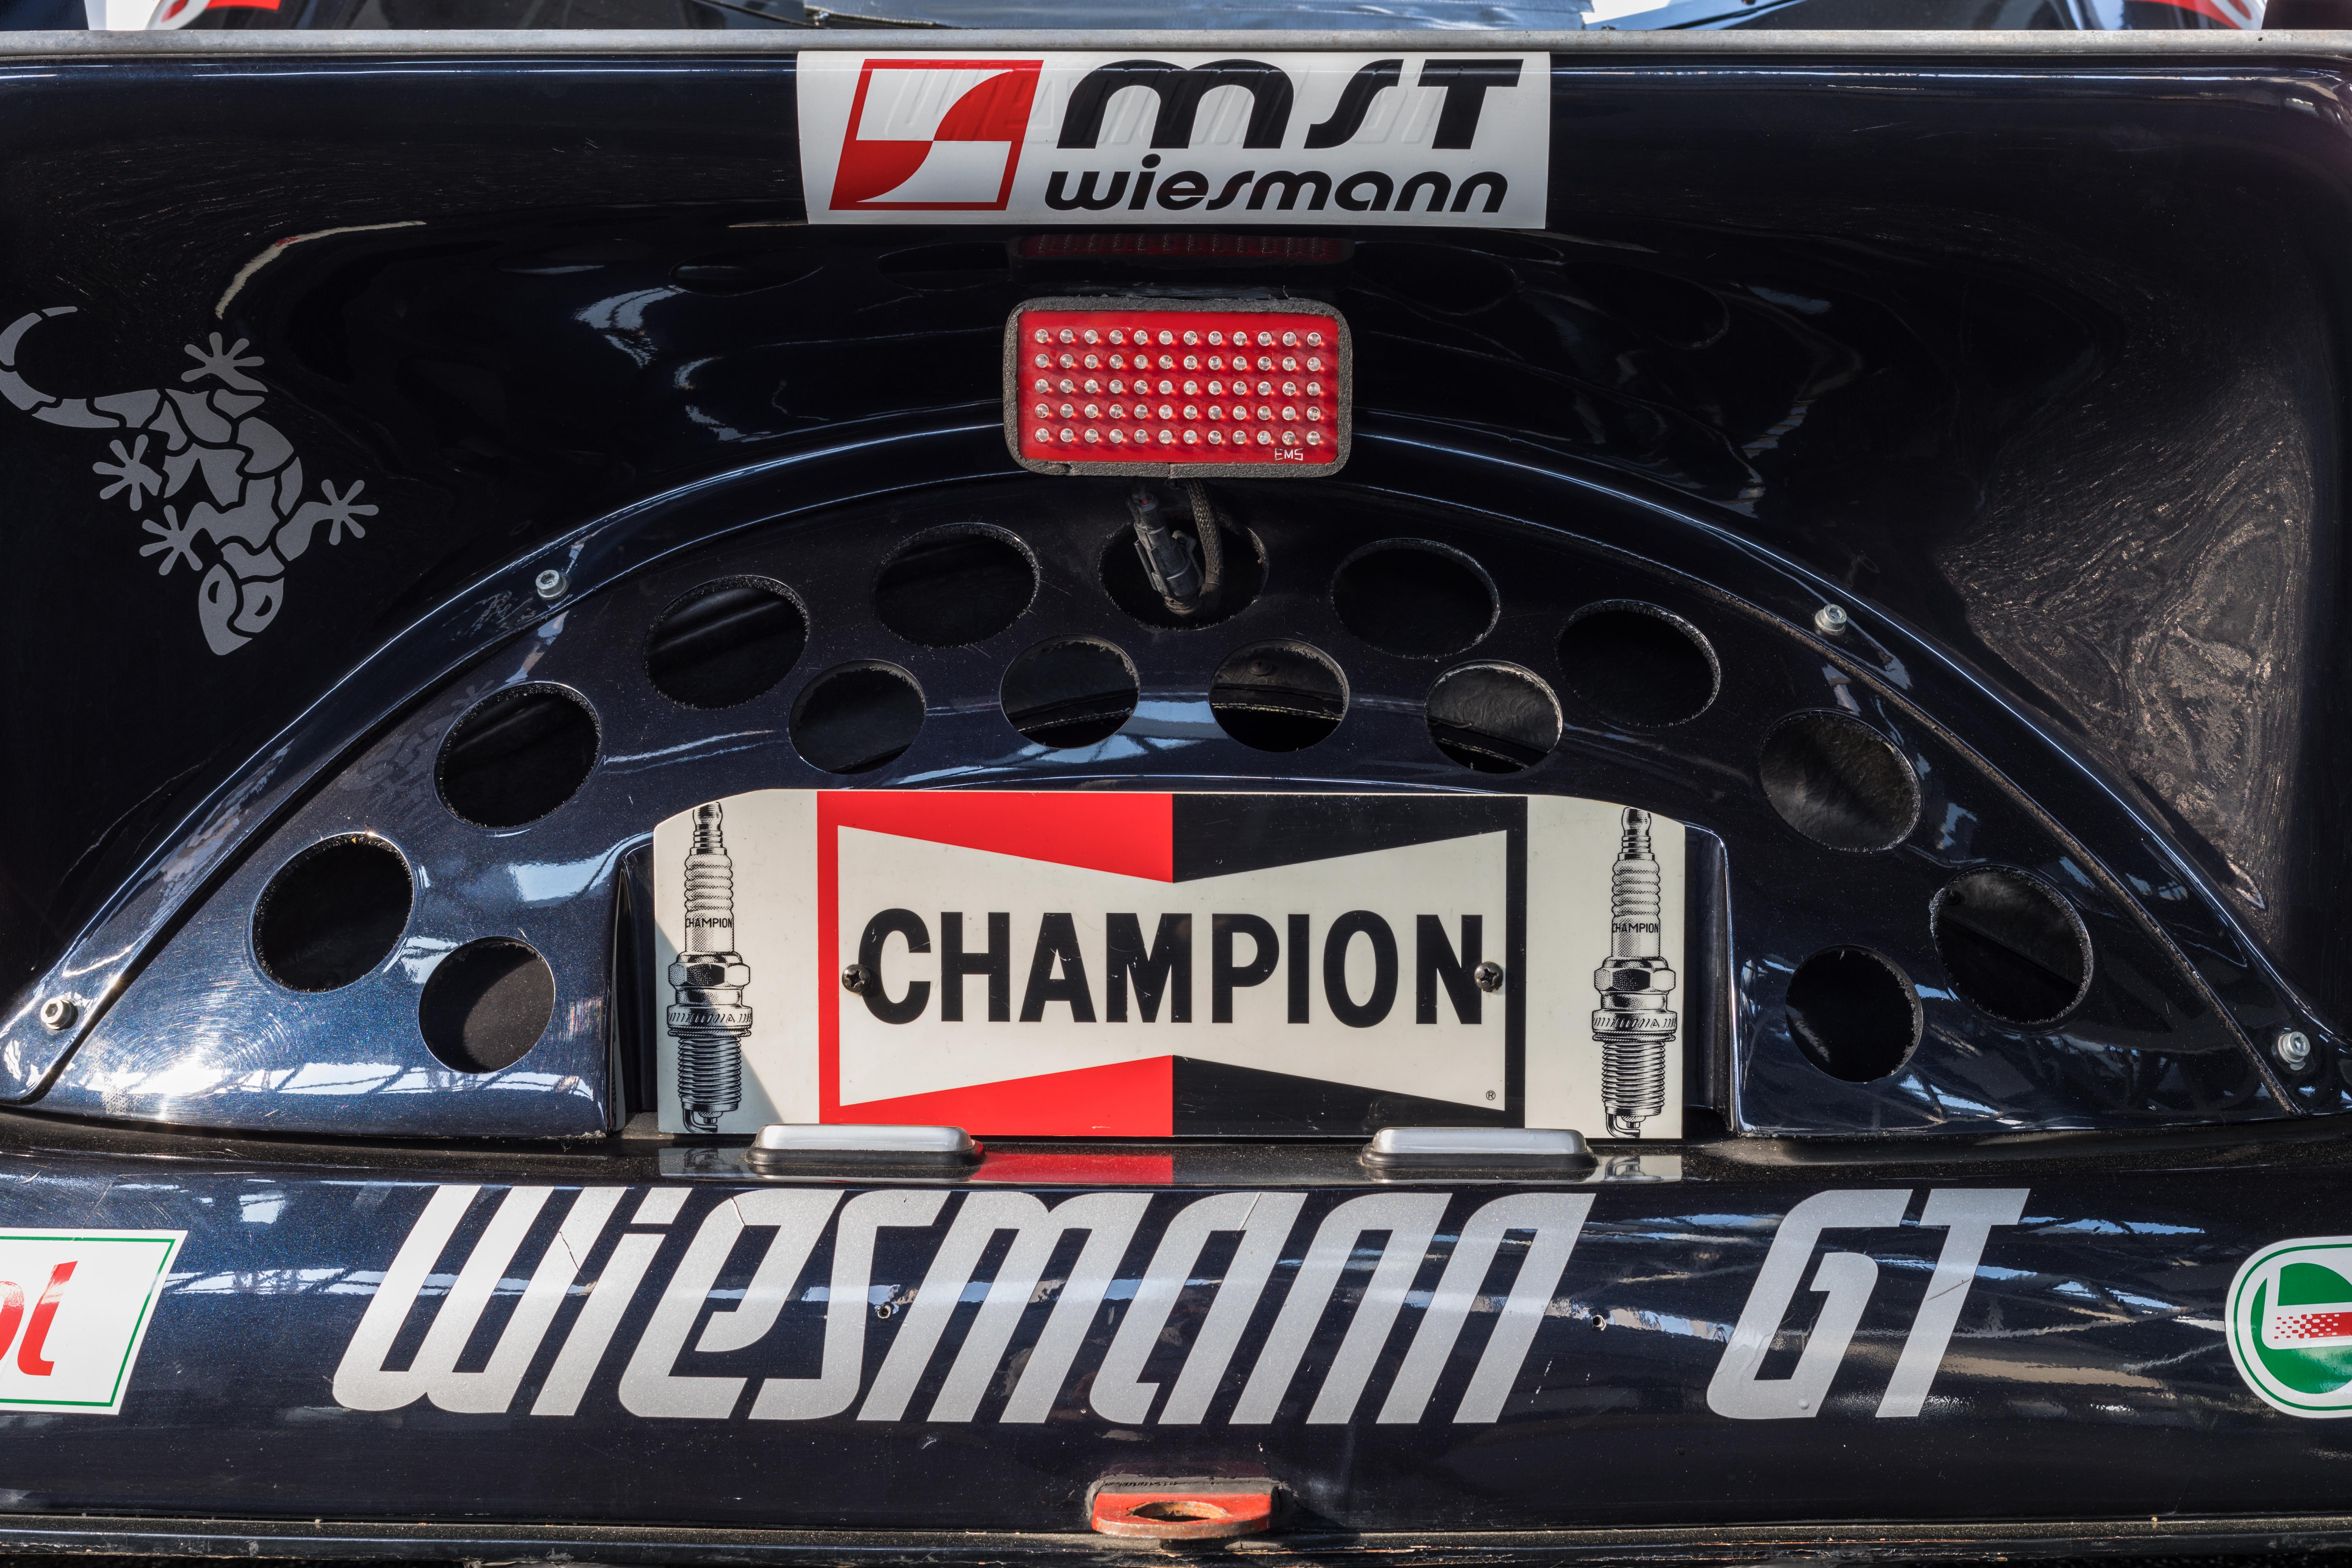 Wiesmann GT at Wiesmann Sports Cars, Dülmen, North Rhine-Westphalia, Germany (2018) German Wiesmann GT bei Wiesmann Sports Cars, Dülmen, Nordrhein-Westfalen